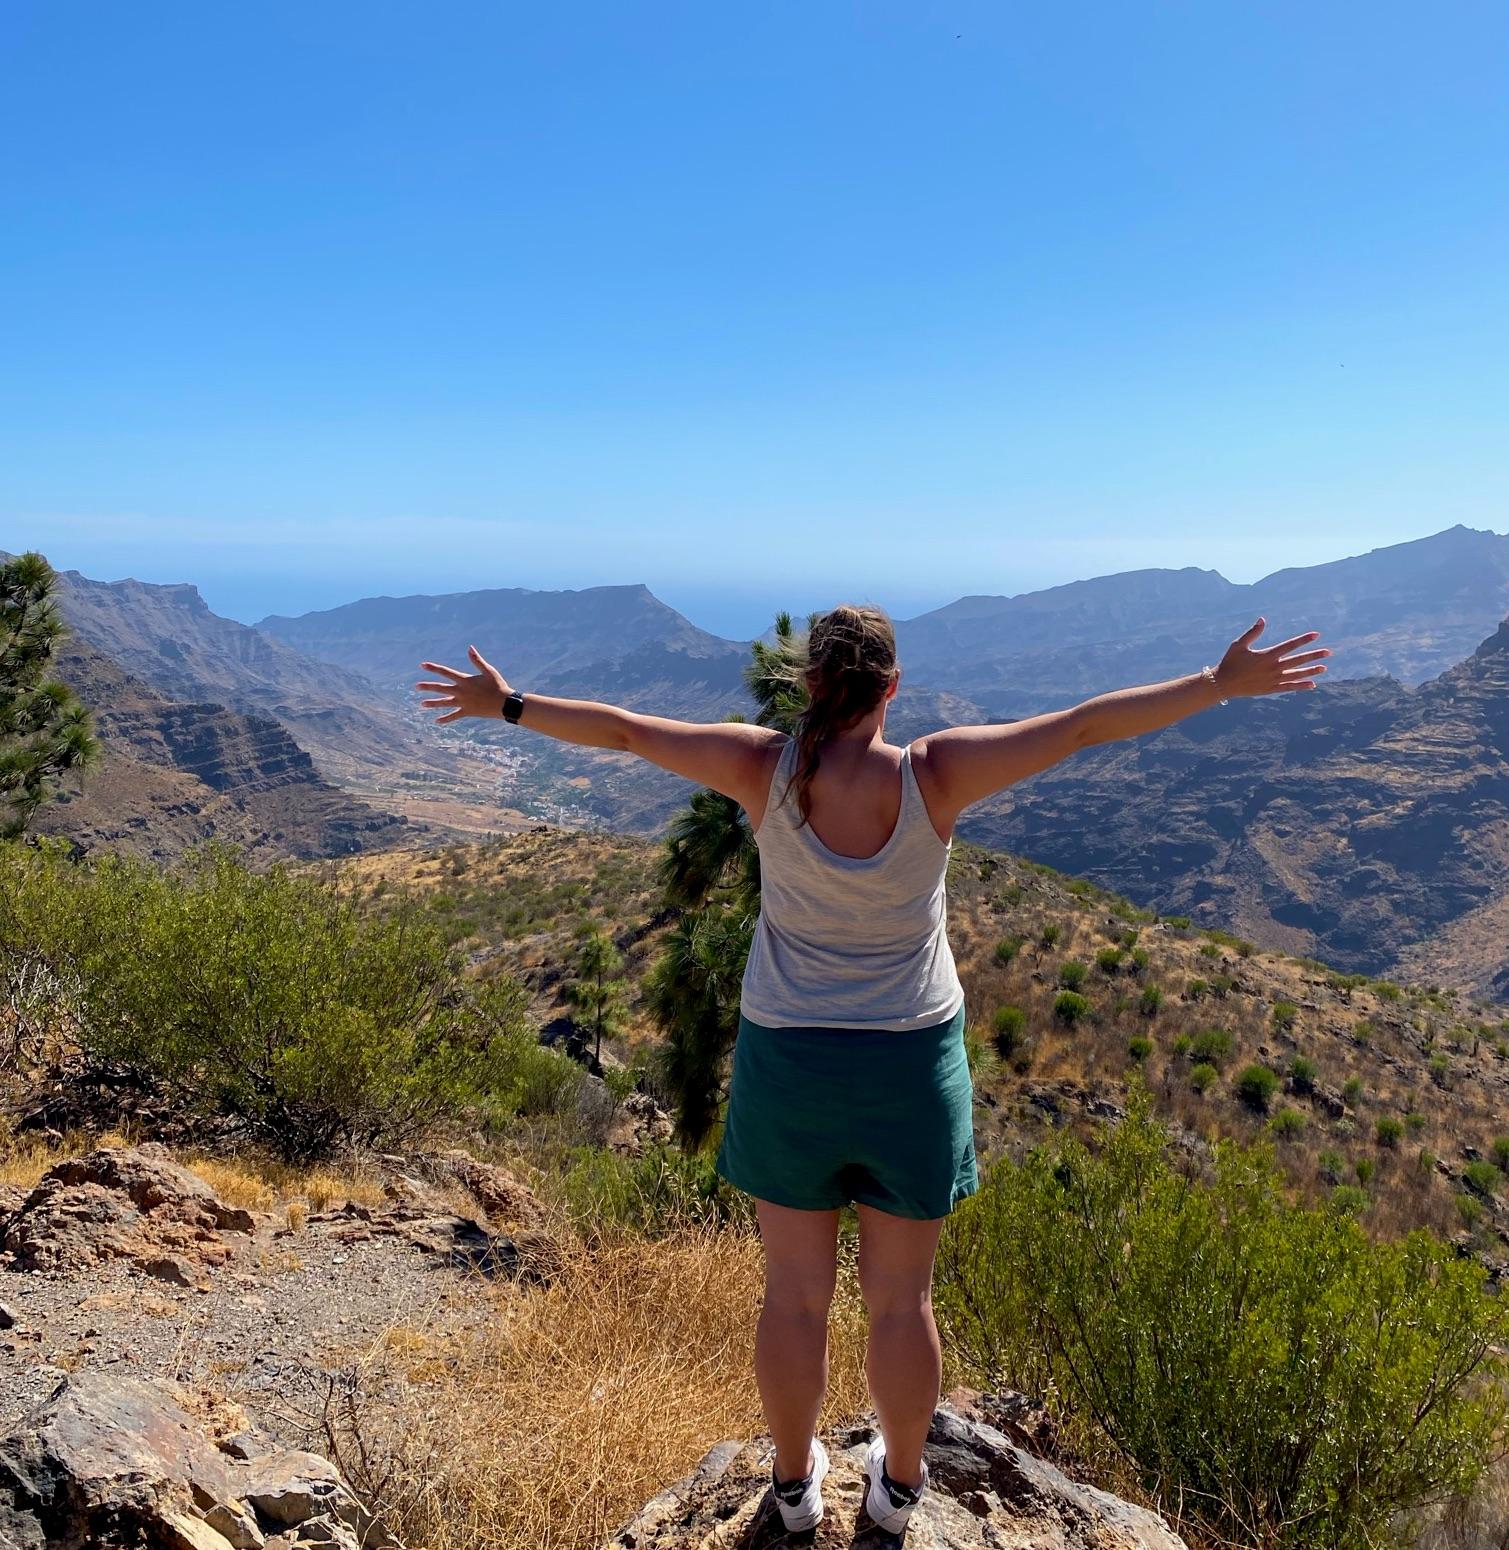 Bergblick an einer Bergstraße auf Gran Canaria